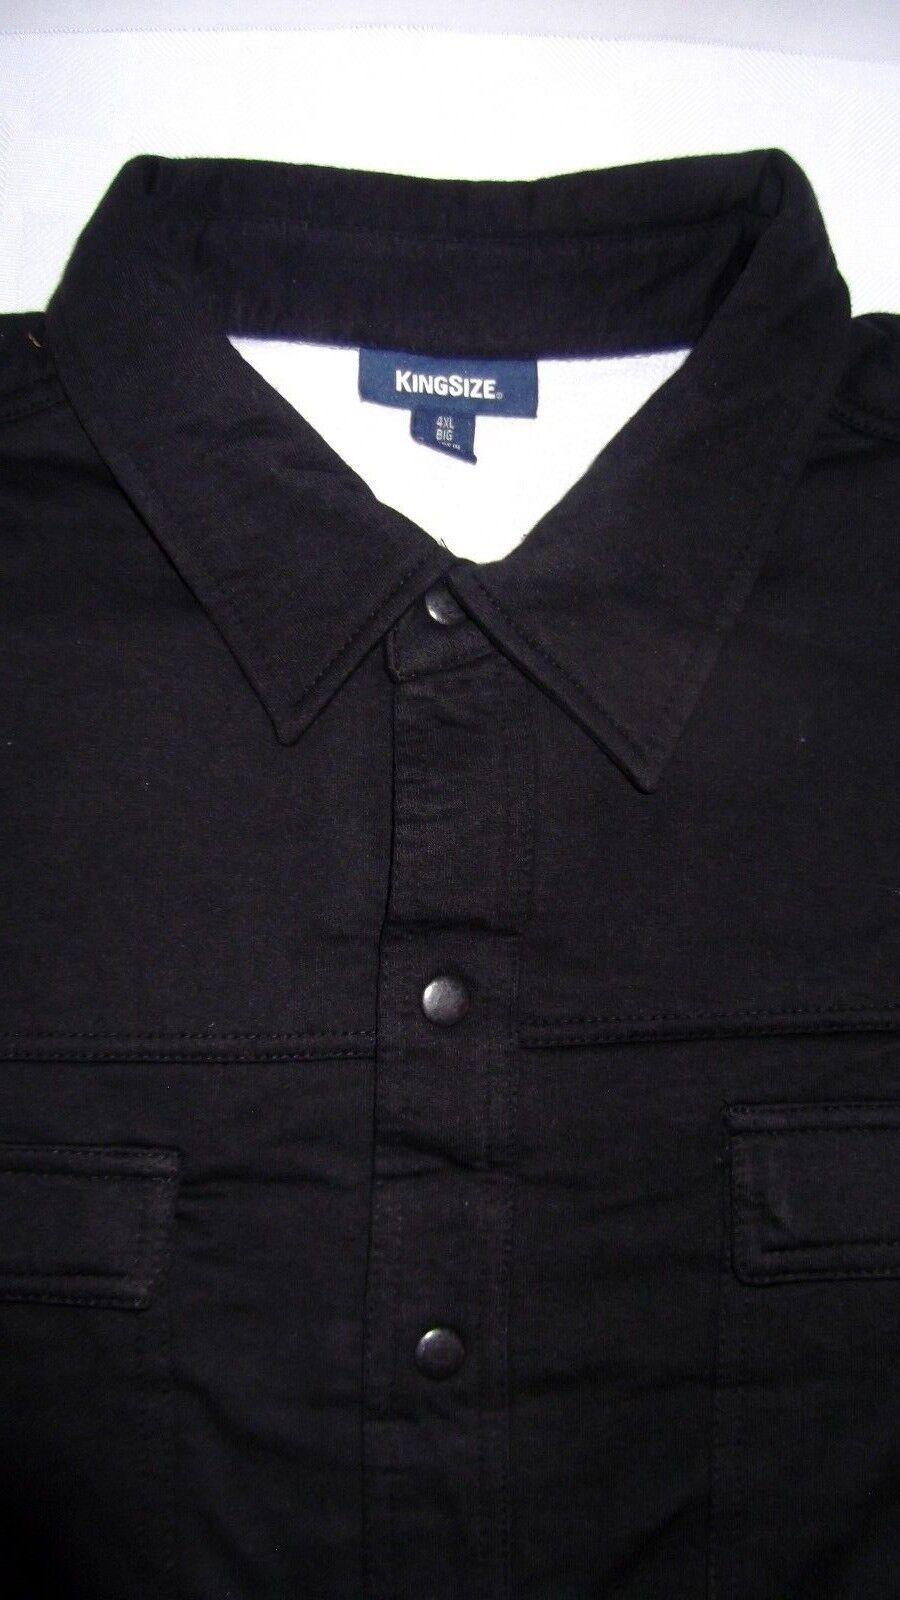 Men Big & Tall Black Thermal Lined Coat Jacket Sizes 2x, 3x,